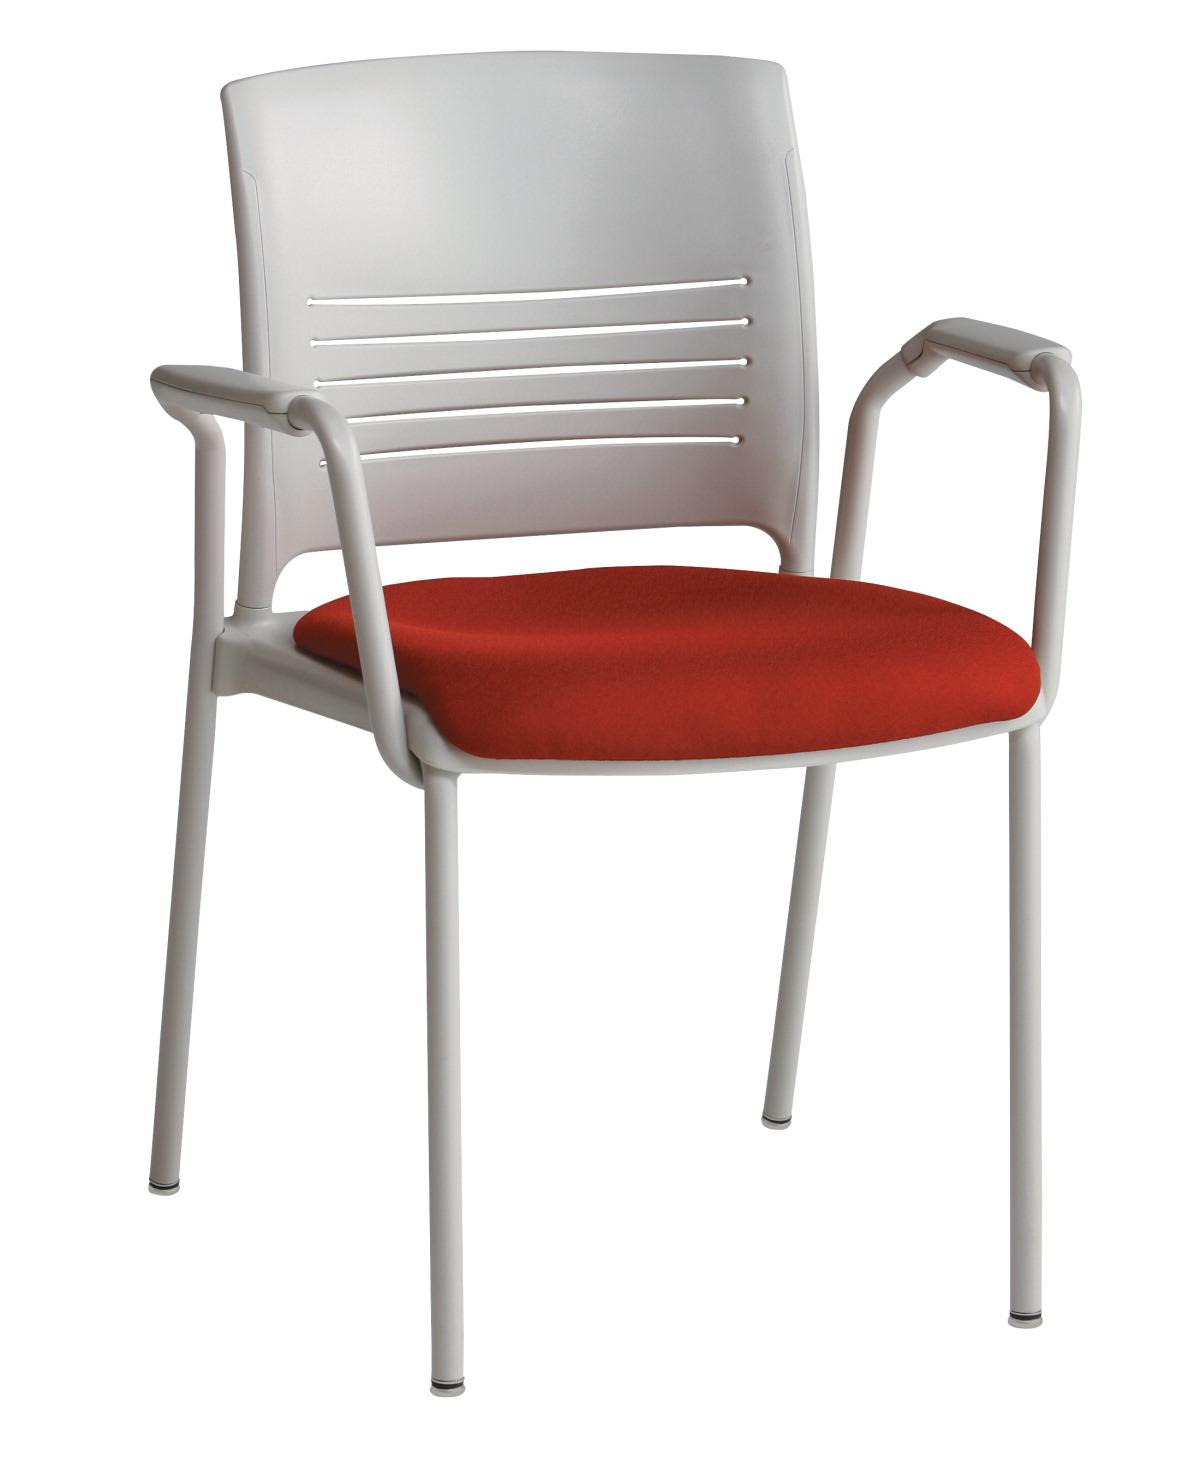 Ki Strive 4 Leg Loop Arm Poly Seat Stack Chair With Glides 17 12